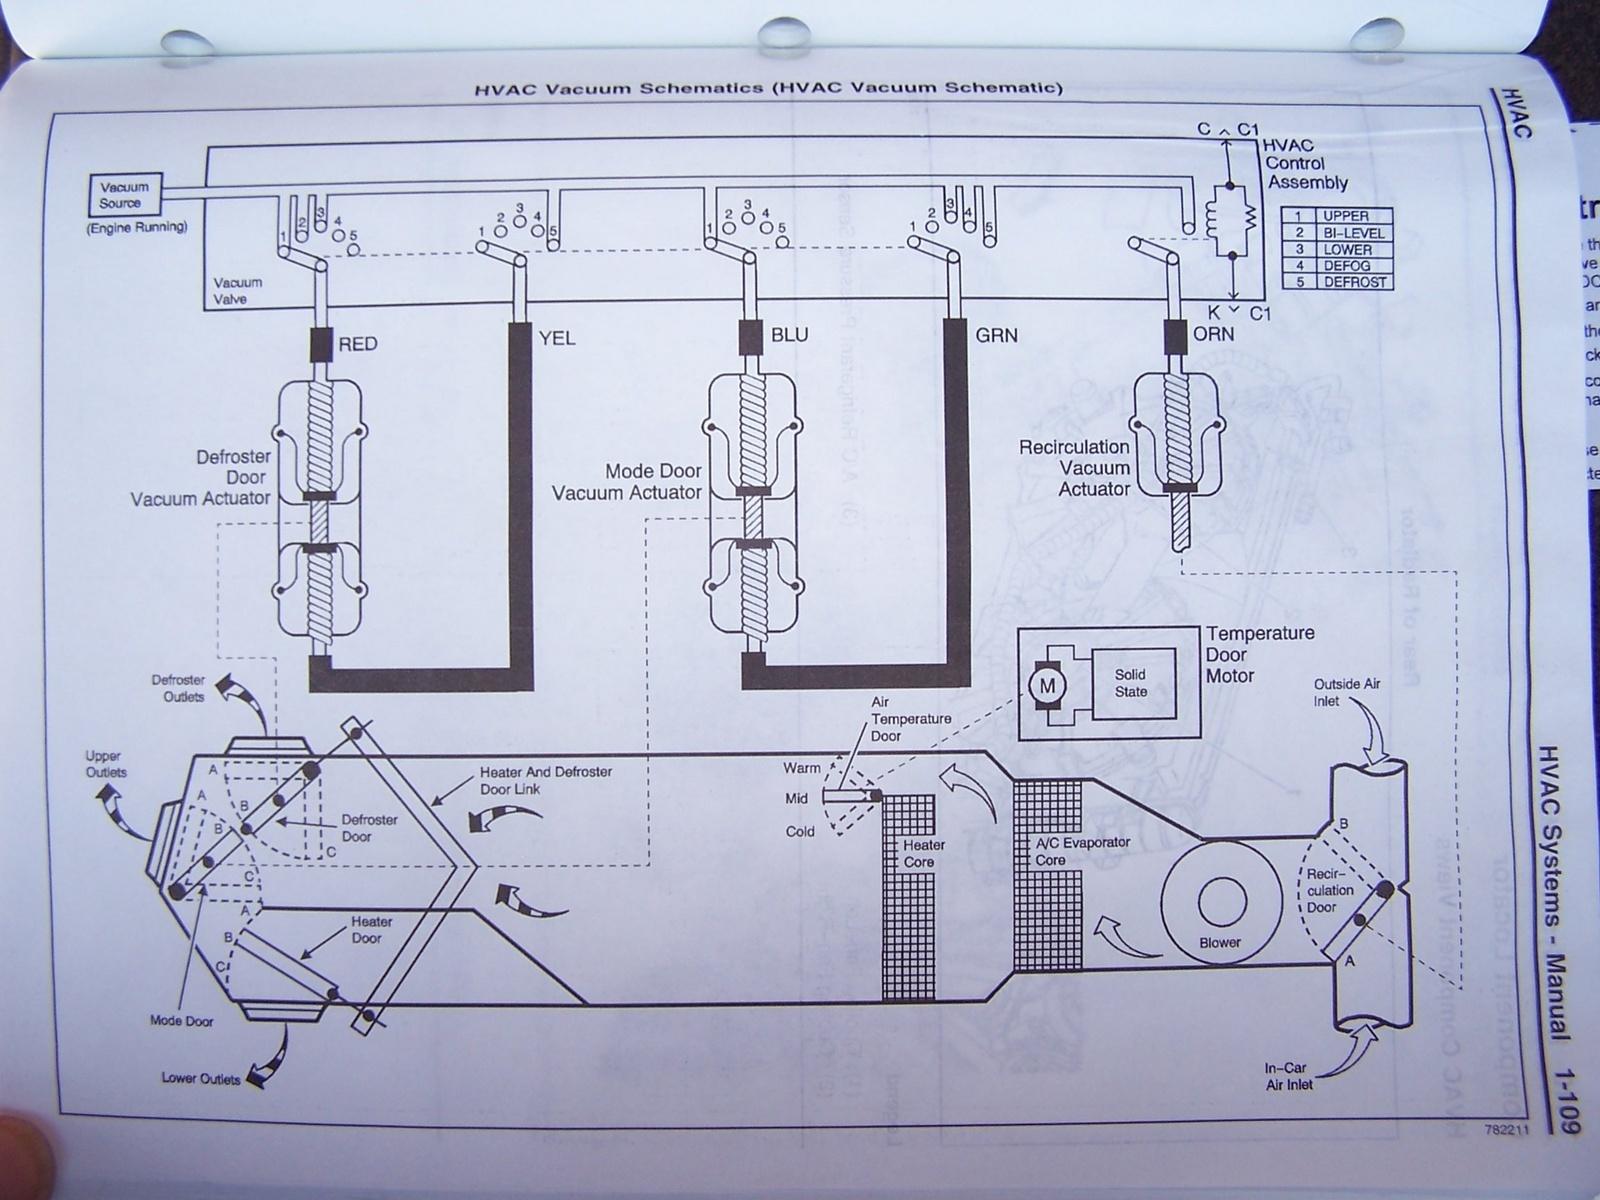 91 Jeep Wrangler Headlight Wiring Diagram Gmc Sierra 1500 Questions I Have No Air Flow Through